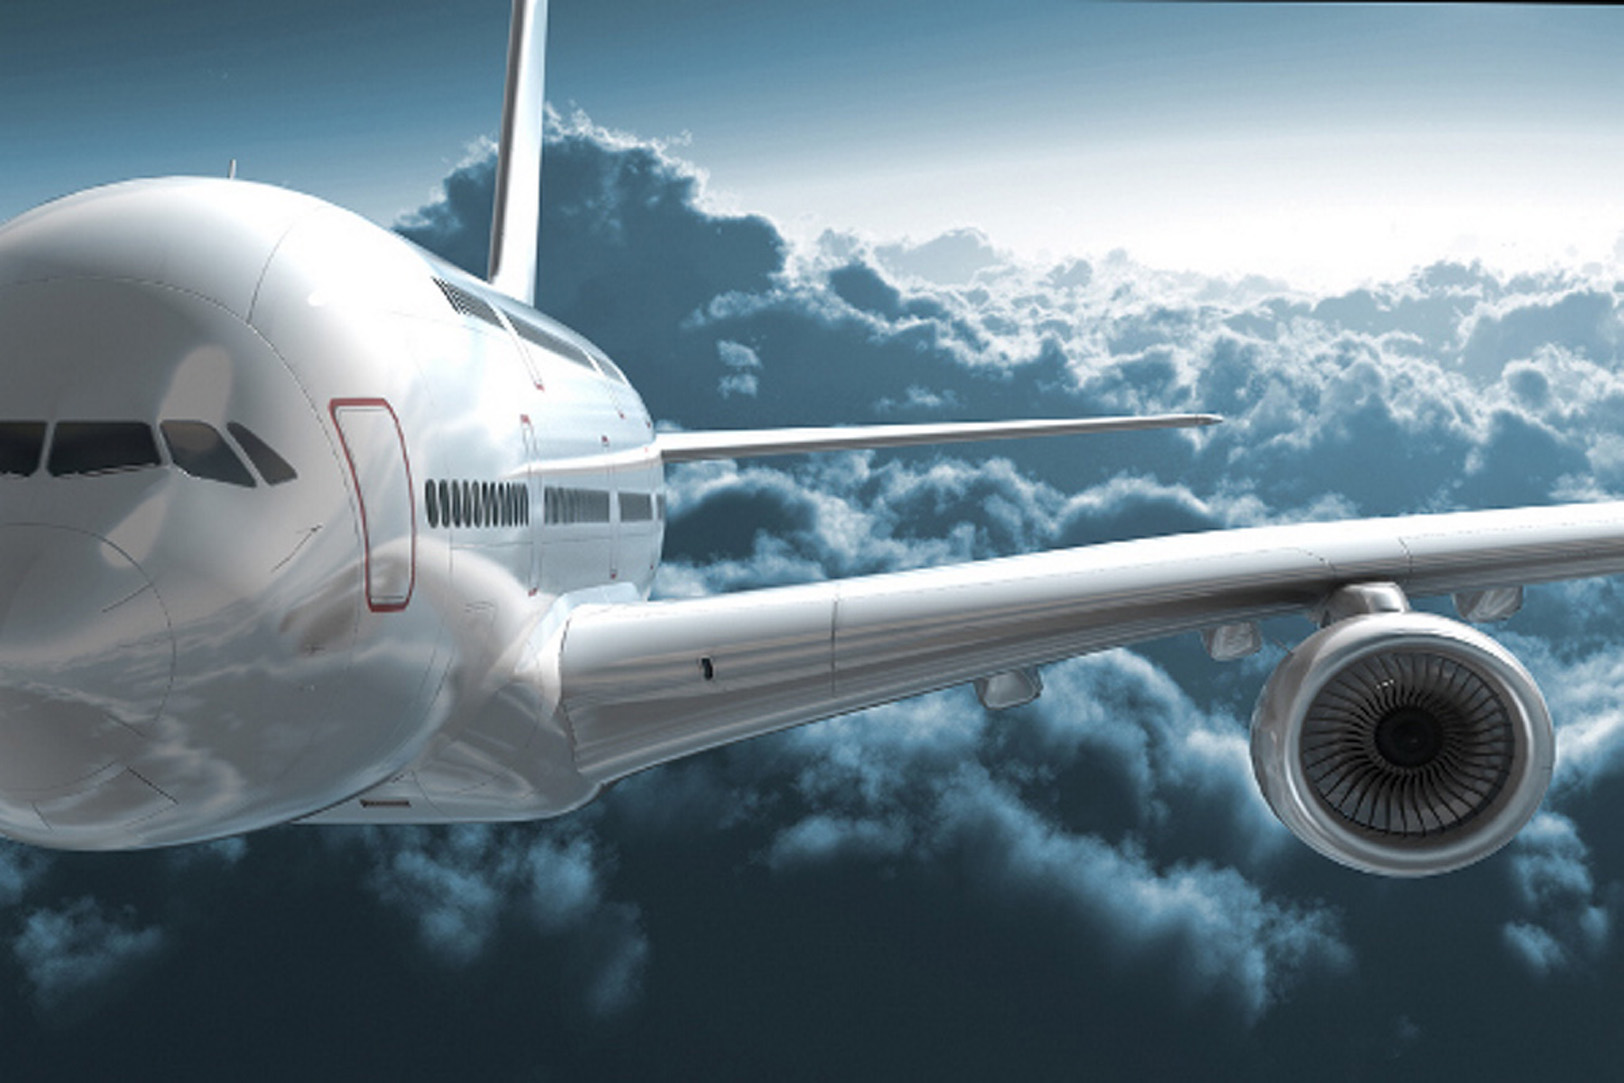 Volar en avión será cada vez más peligroso